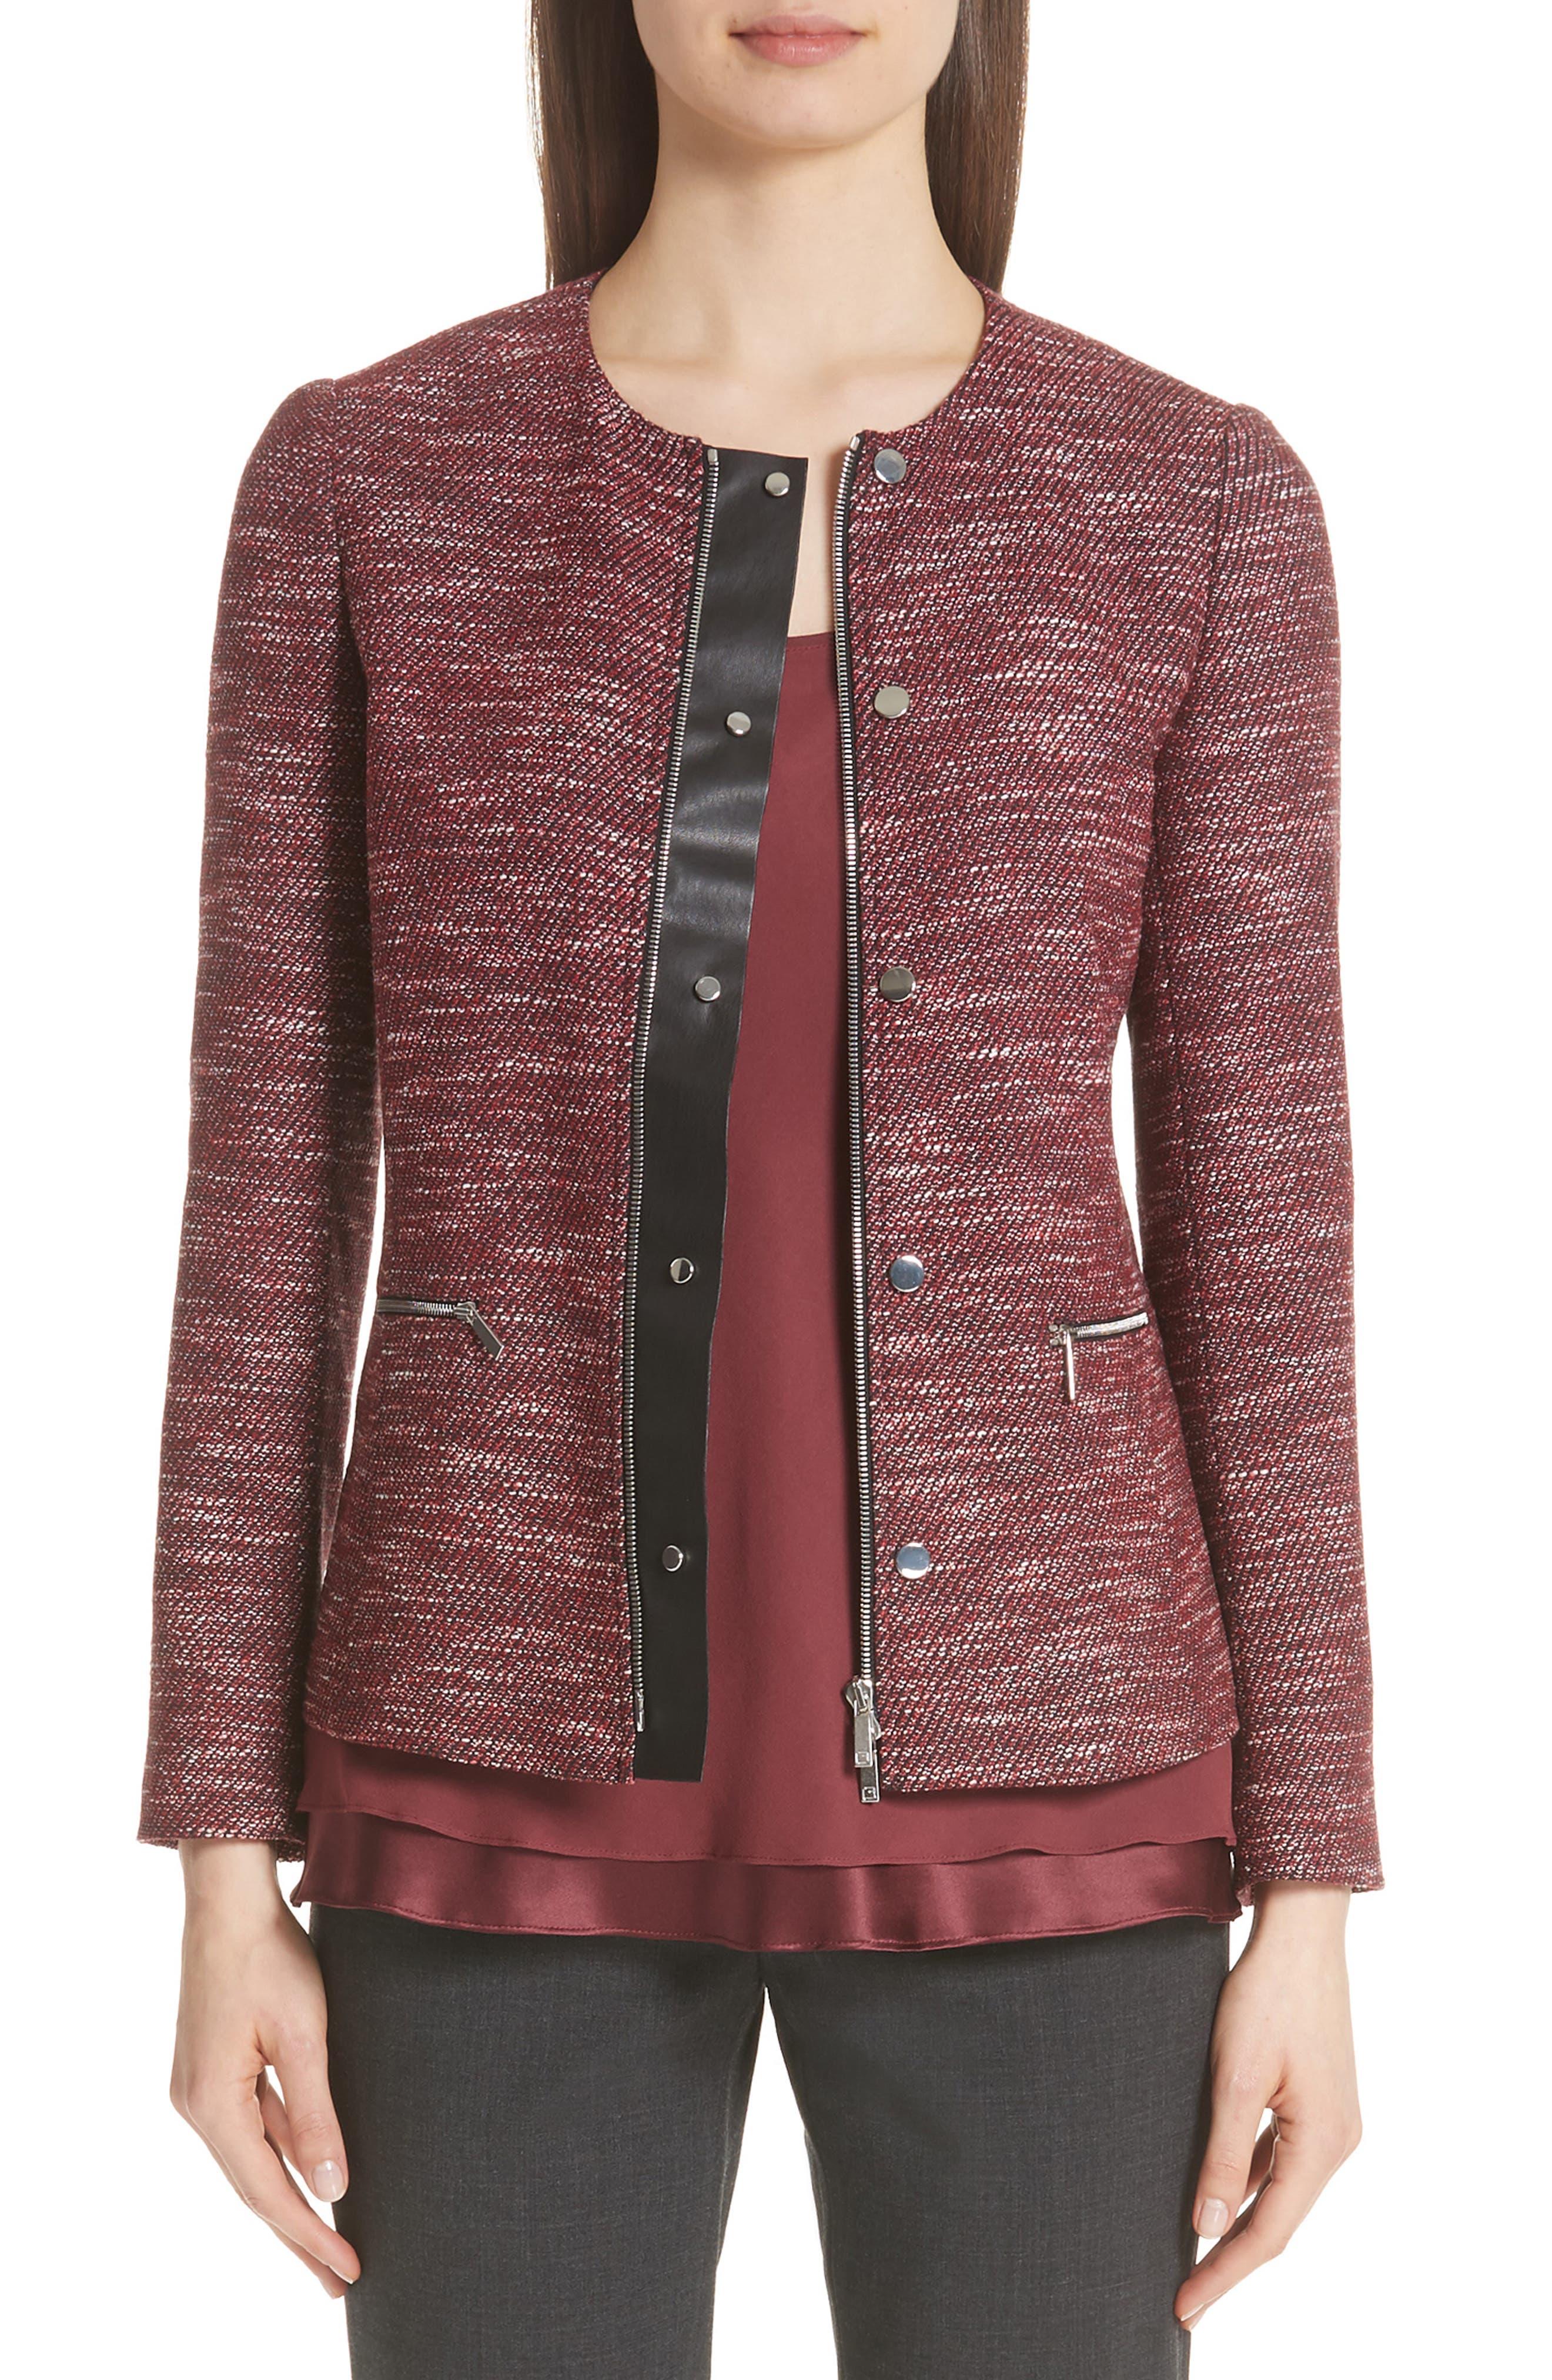 Kerrington Wool Blend Jacket,                             Main thumbnail 1, color,                             930